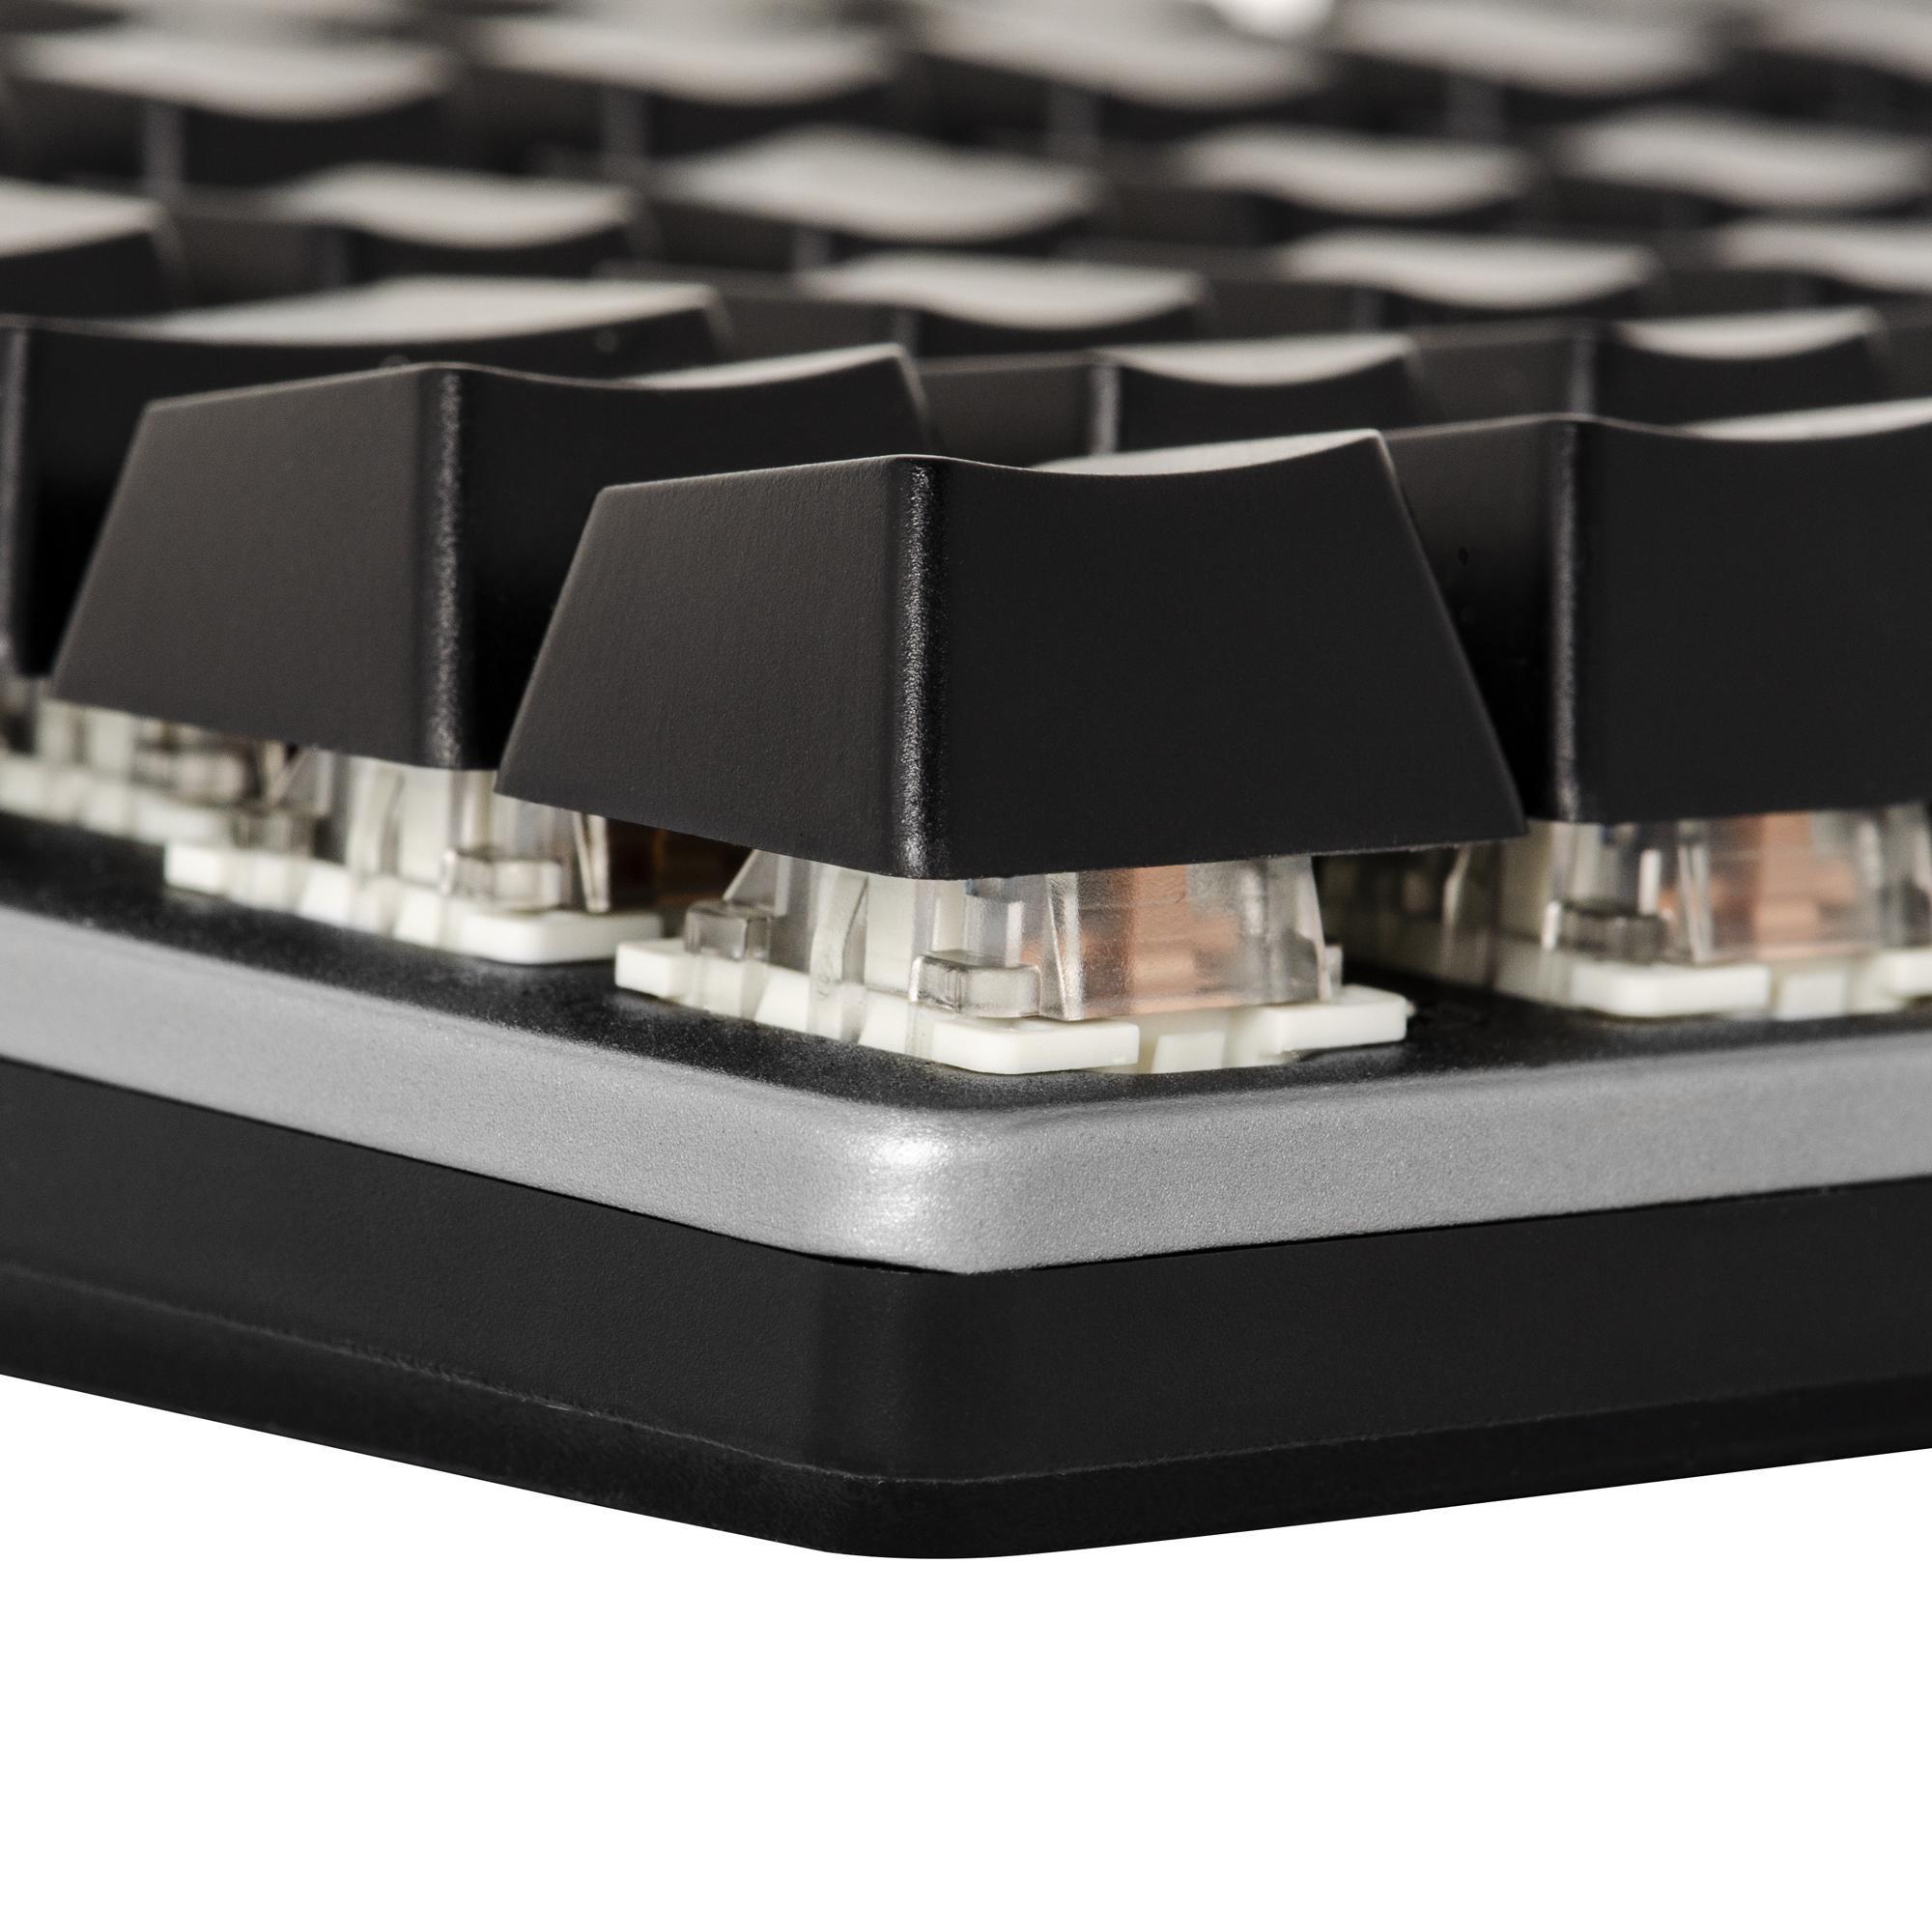 teclado gamer rapido fortrek pro k7 rainbow usb mecanico 48265 2000 198432 1